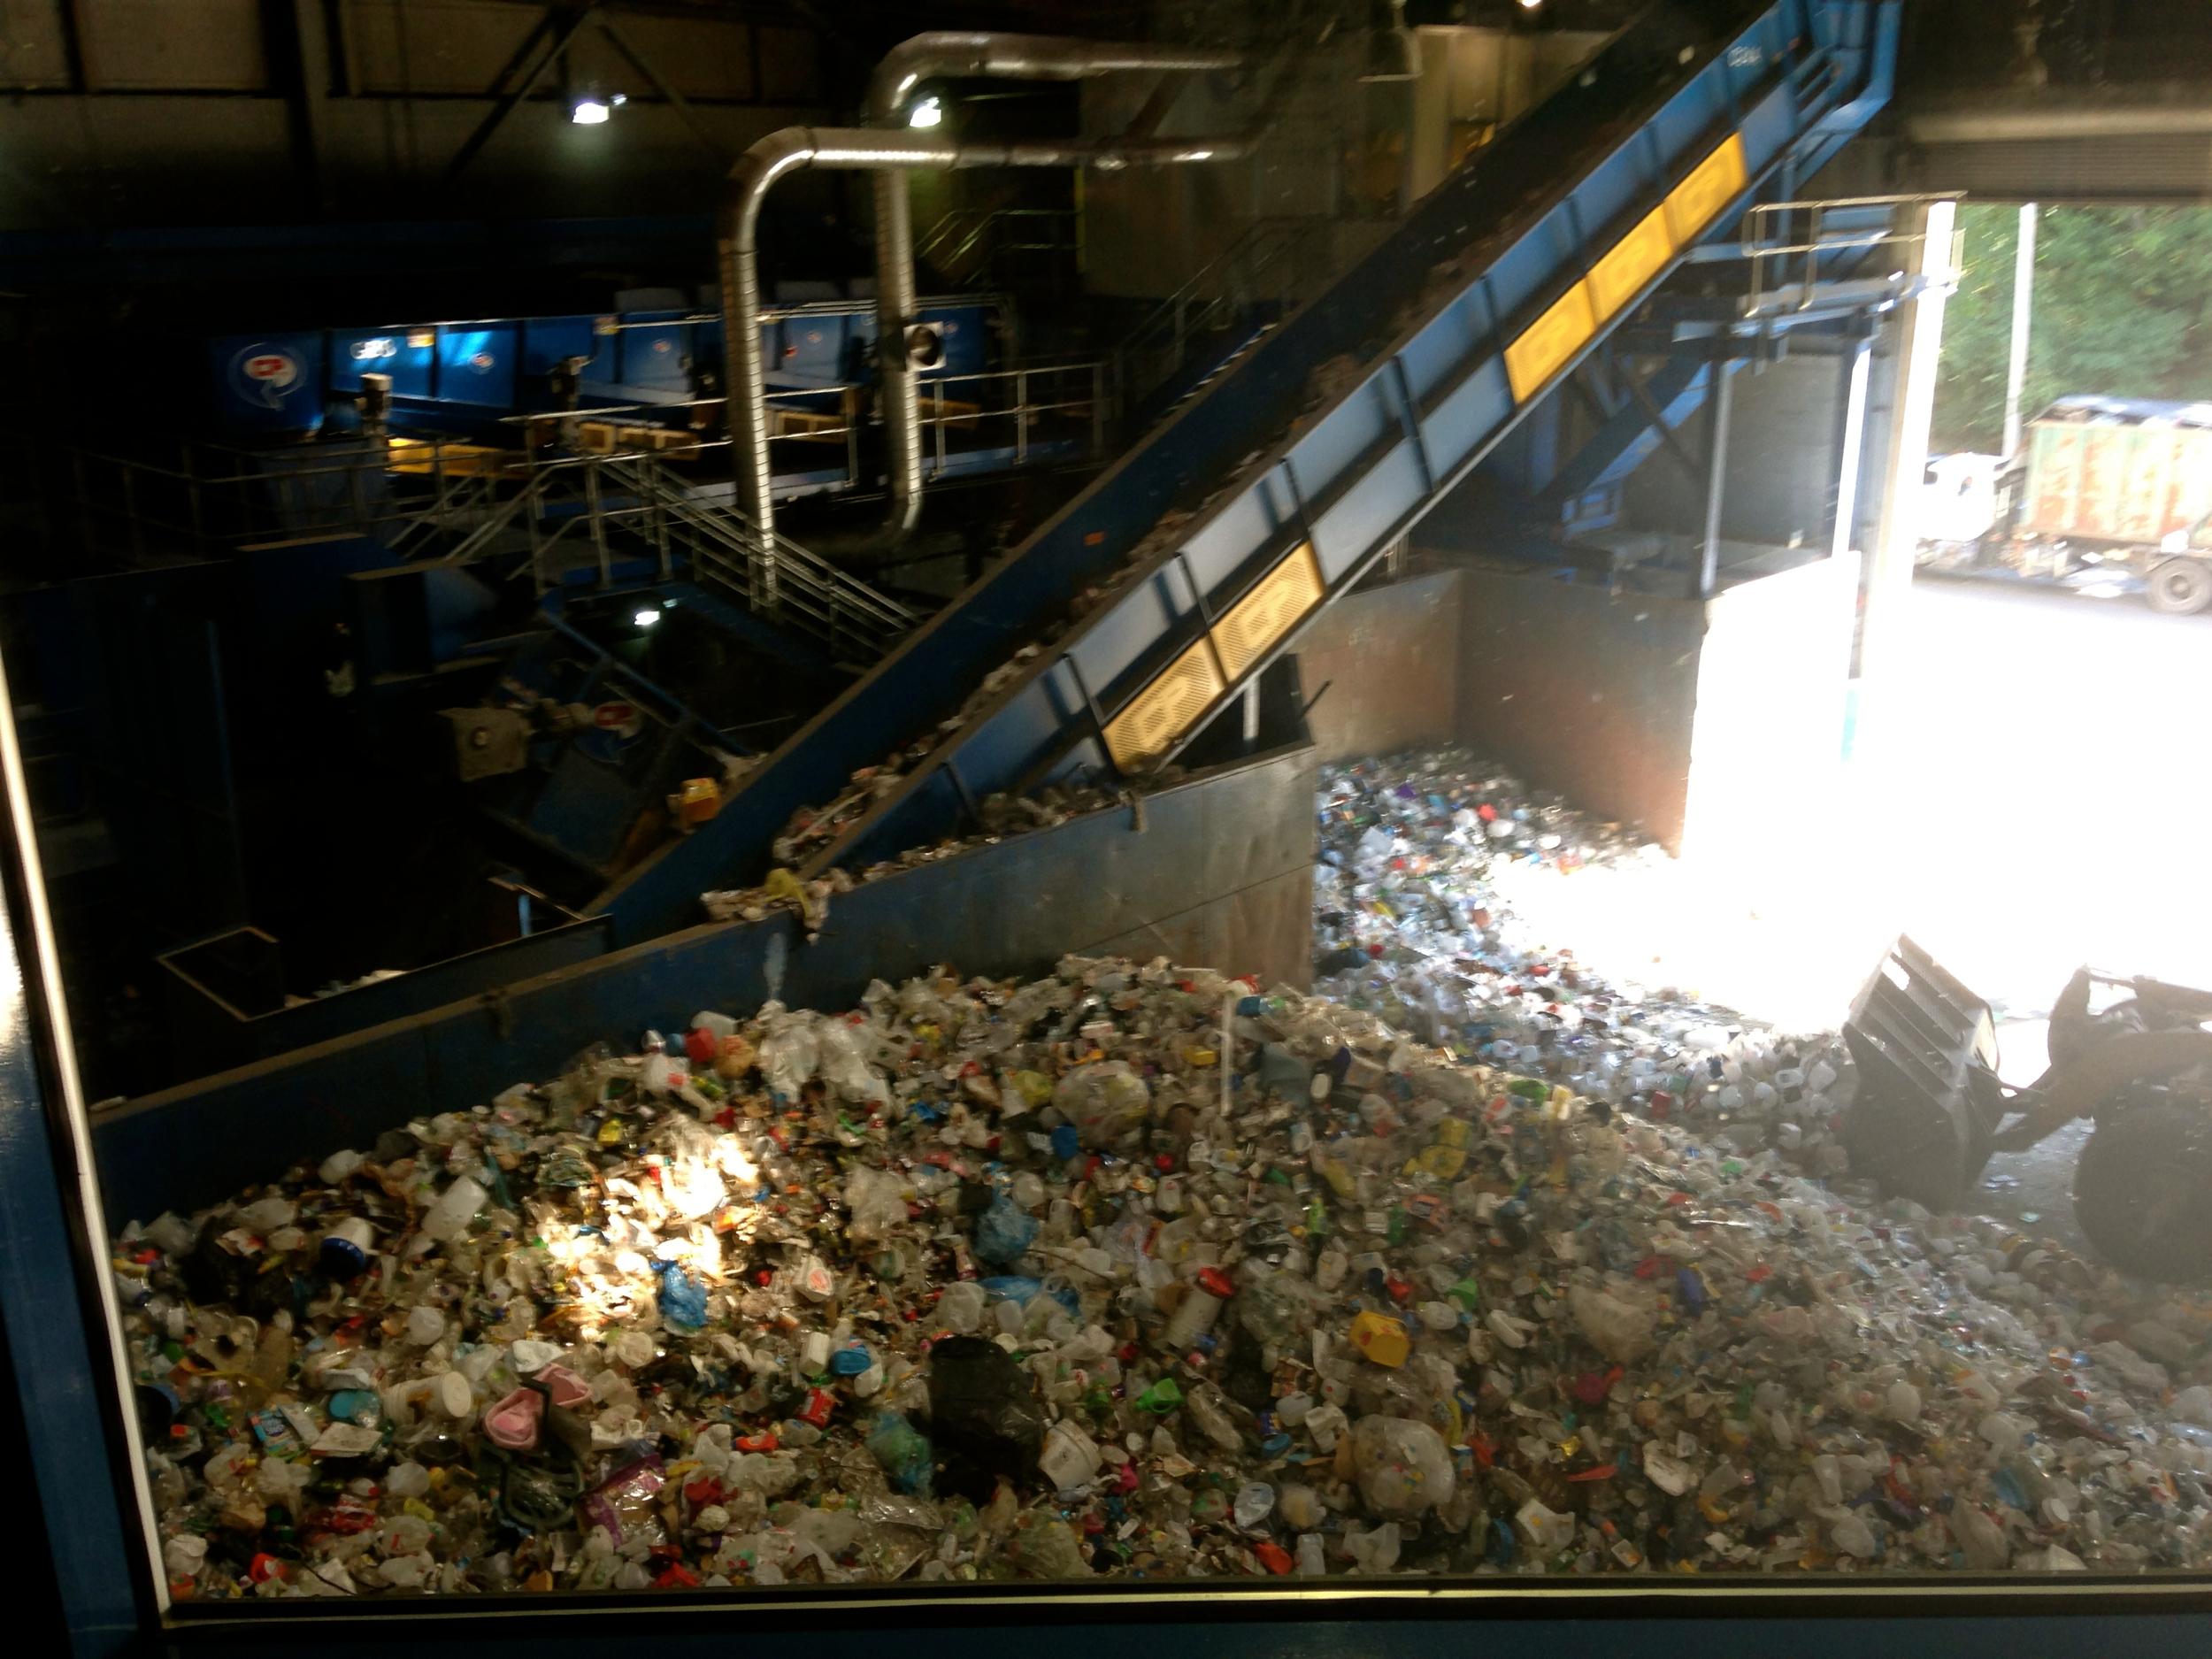 MRF Recycling Center Sorting Chute